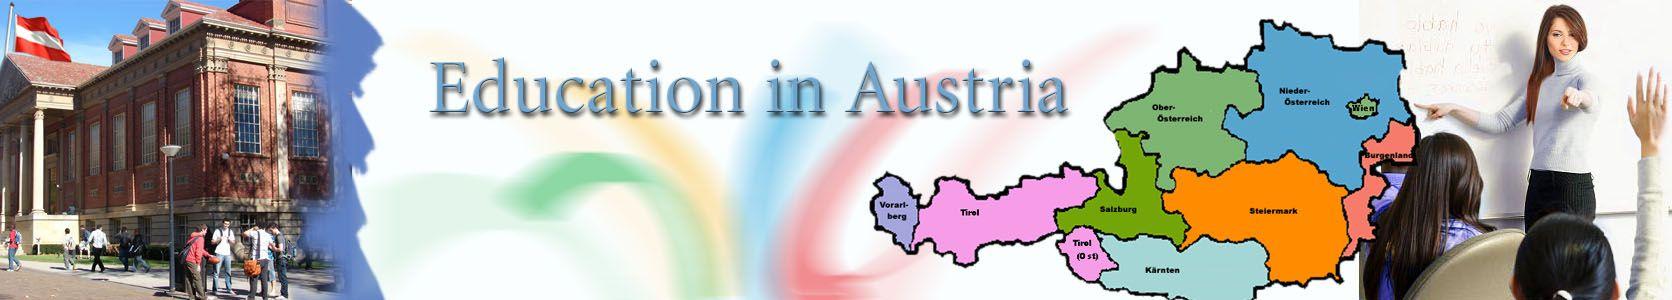 Austria Education Process Contact Sowrya Consultancy www.sowrya.com